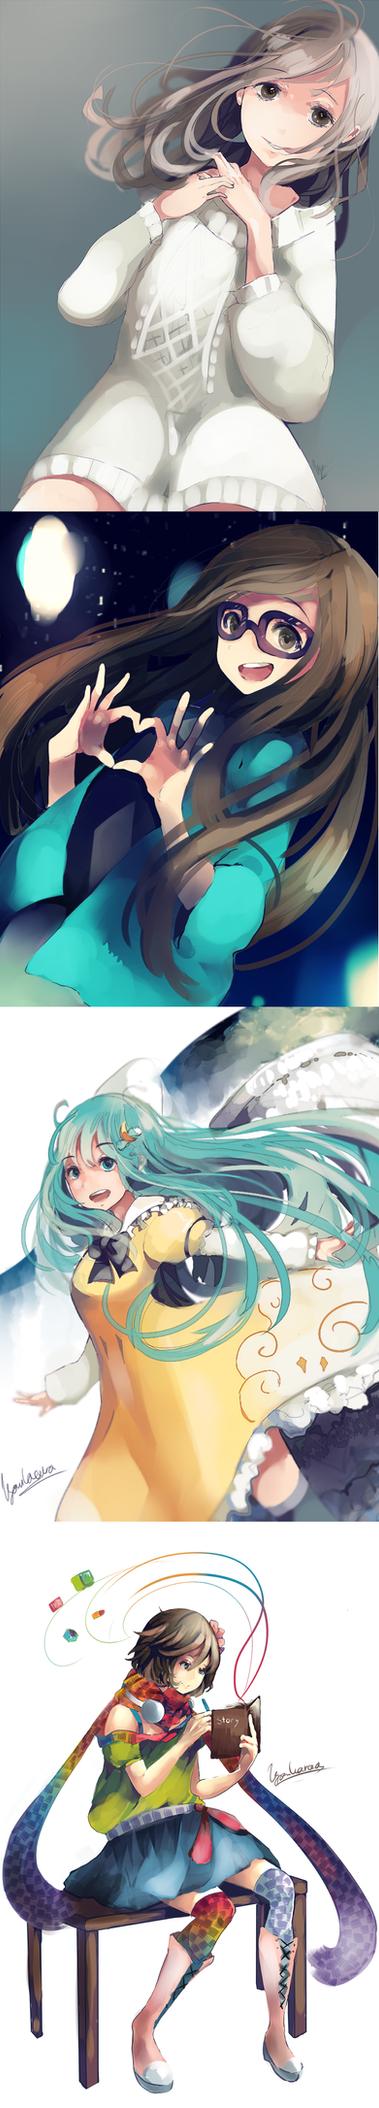 Drawing batch 1 by KyouKaraa